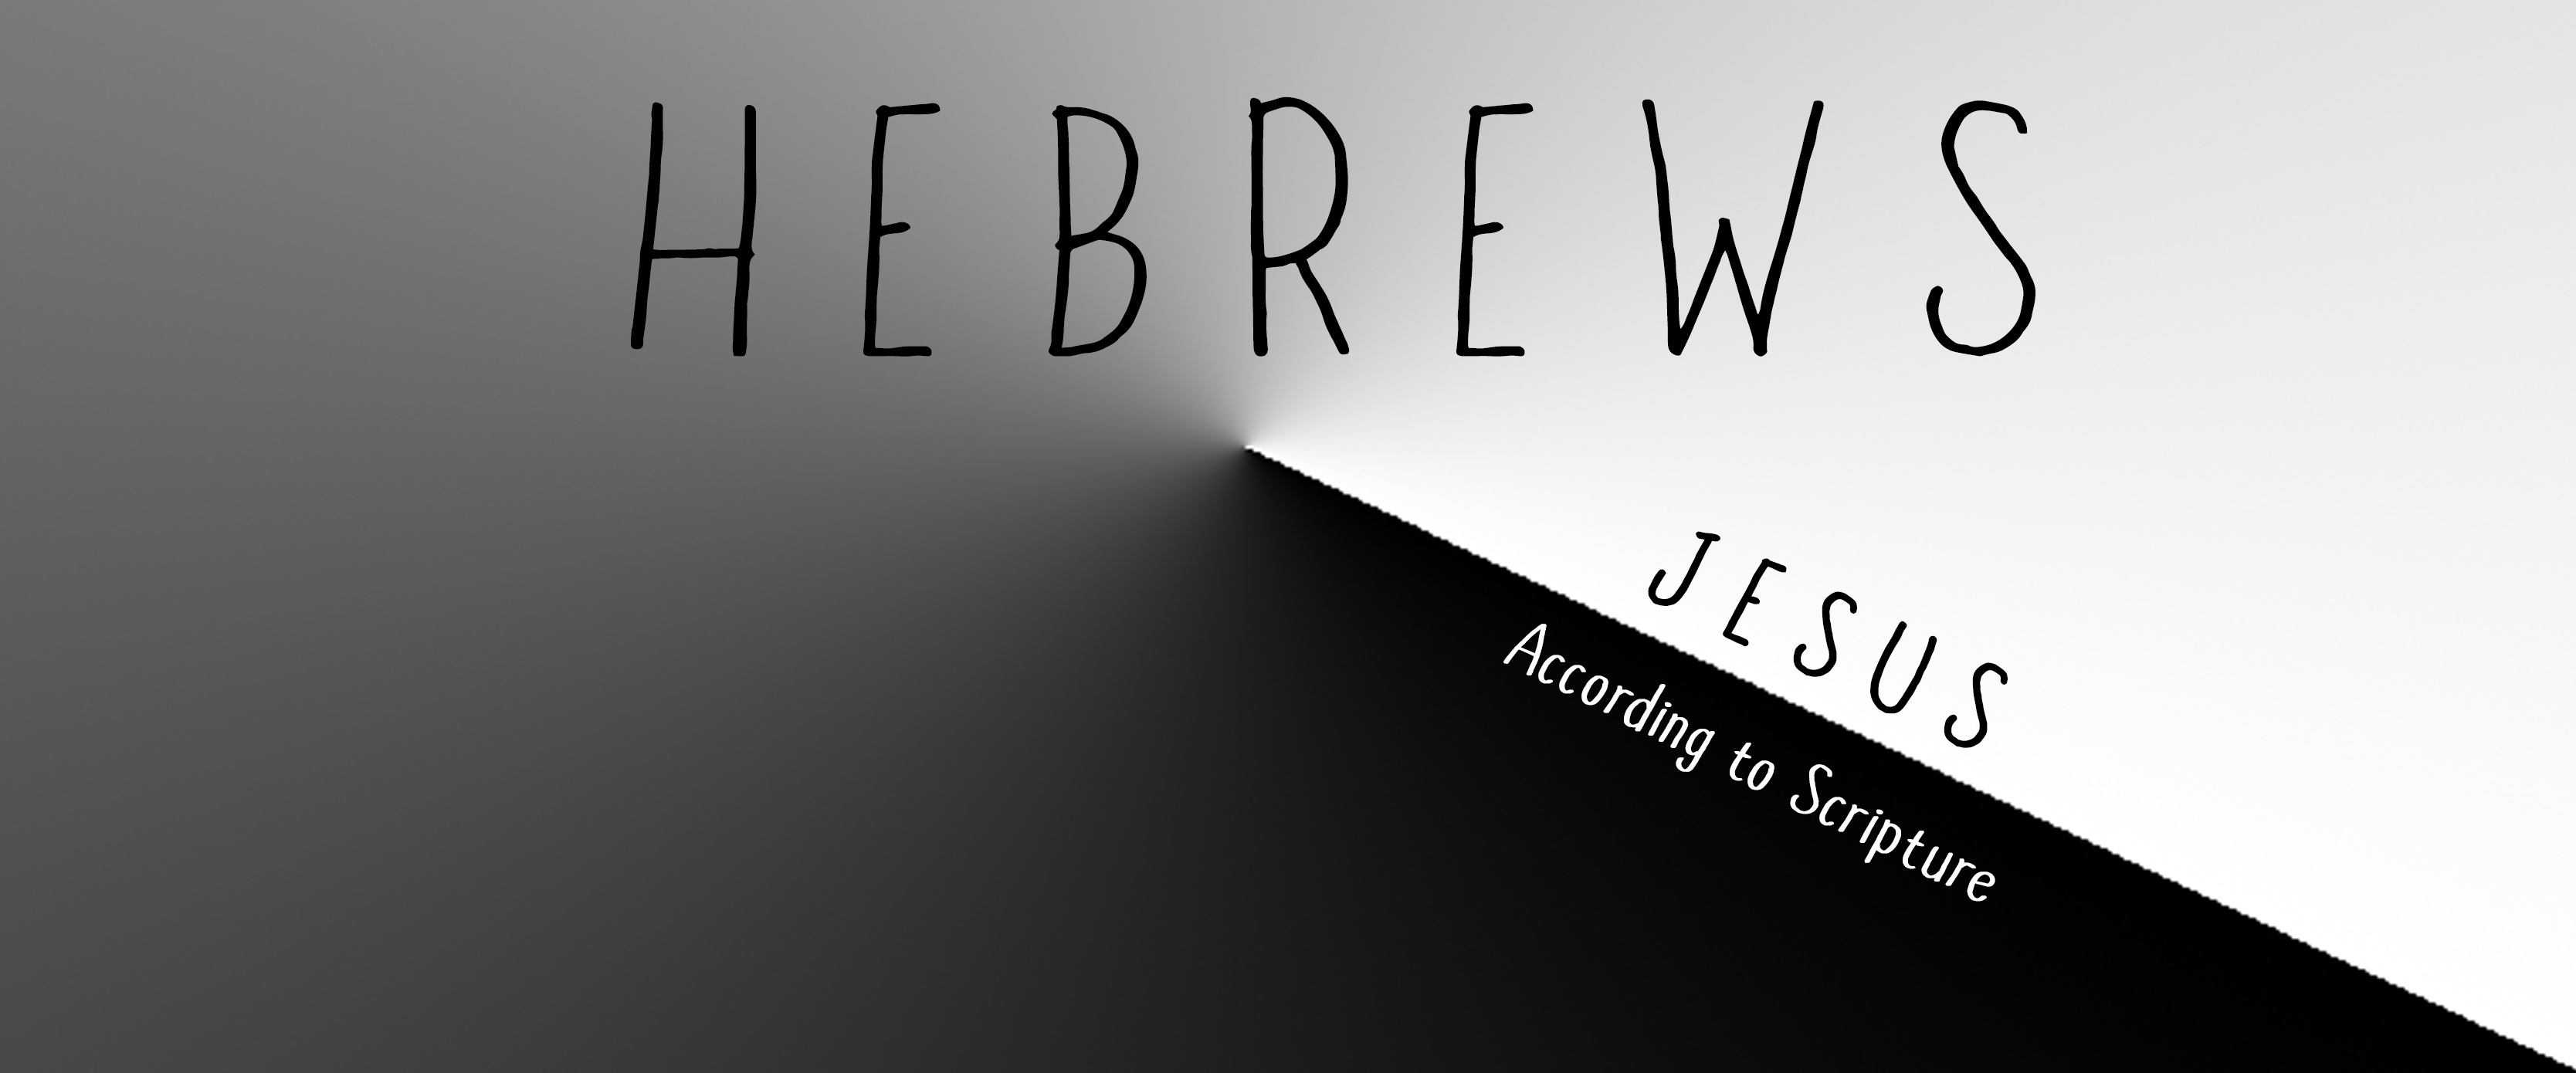 2019-Hebrews-Sermon-Series-Graphic-2-960-x-400